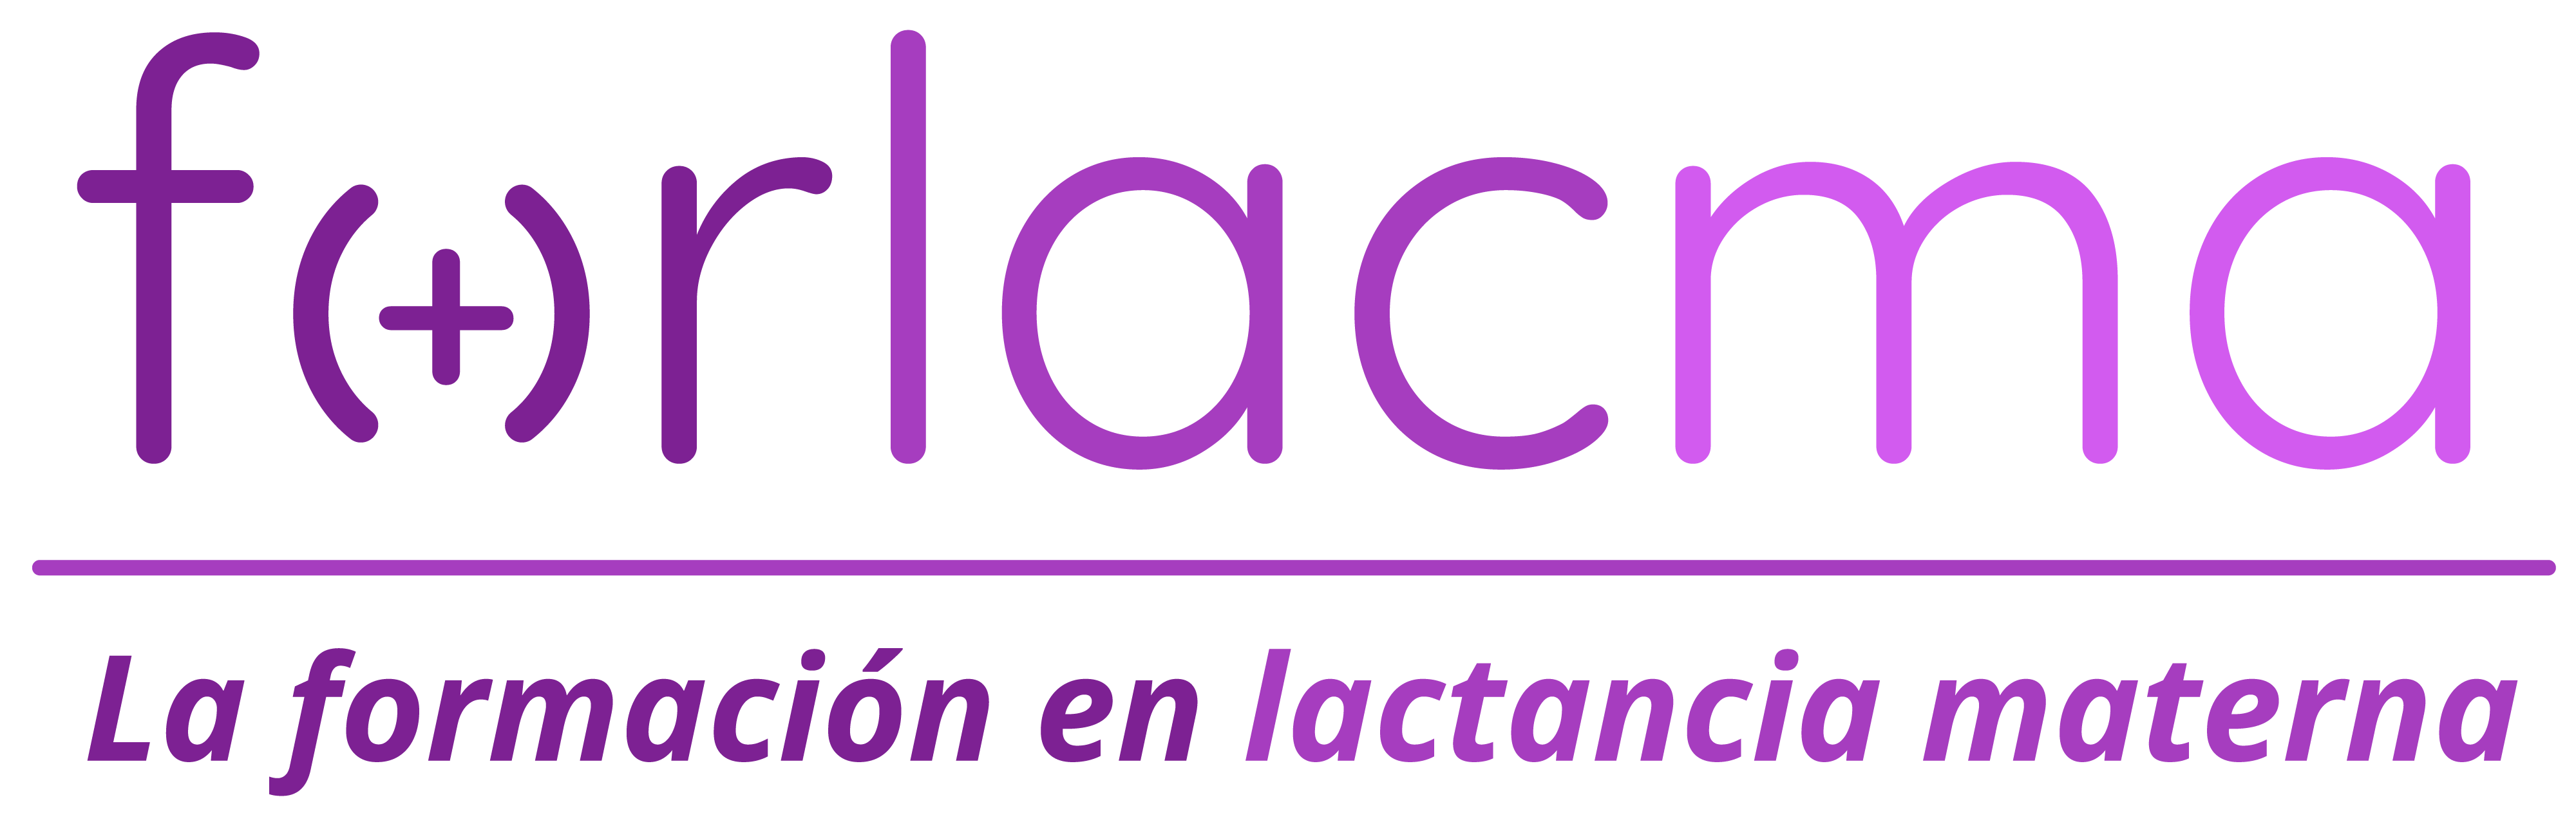 logo oficial forlacma claim_Mesa de trabajo 1